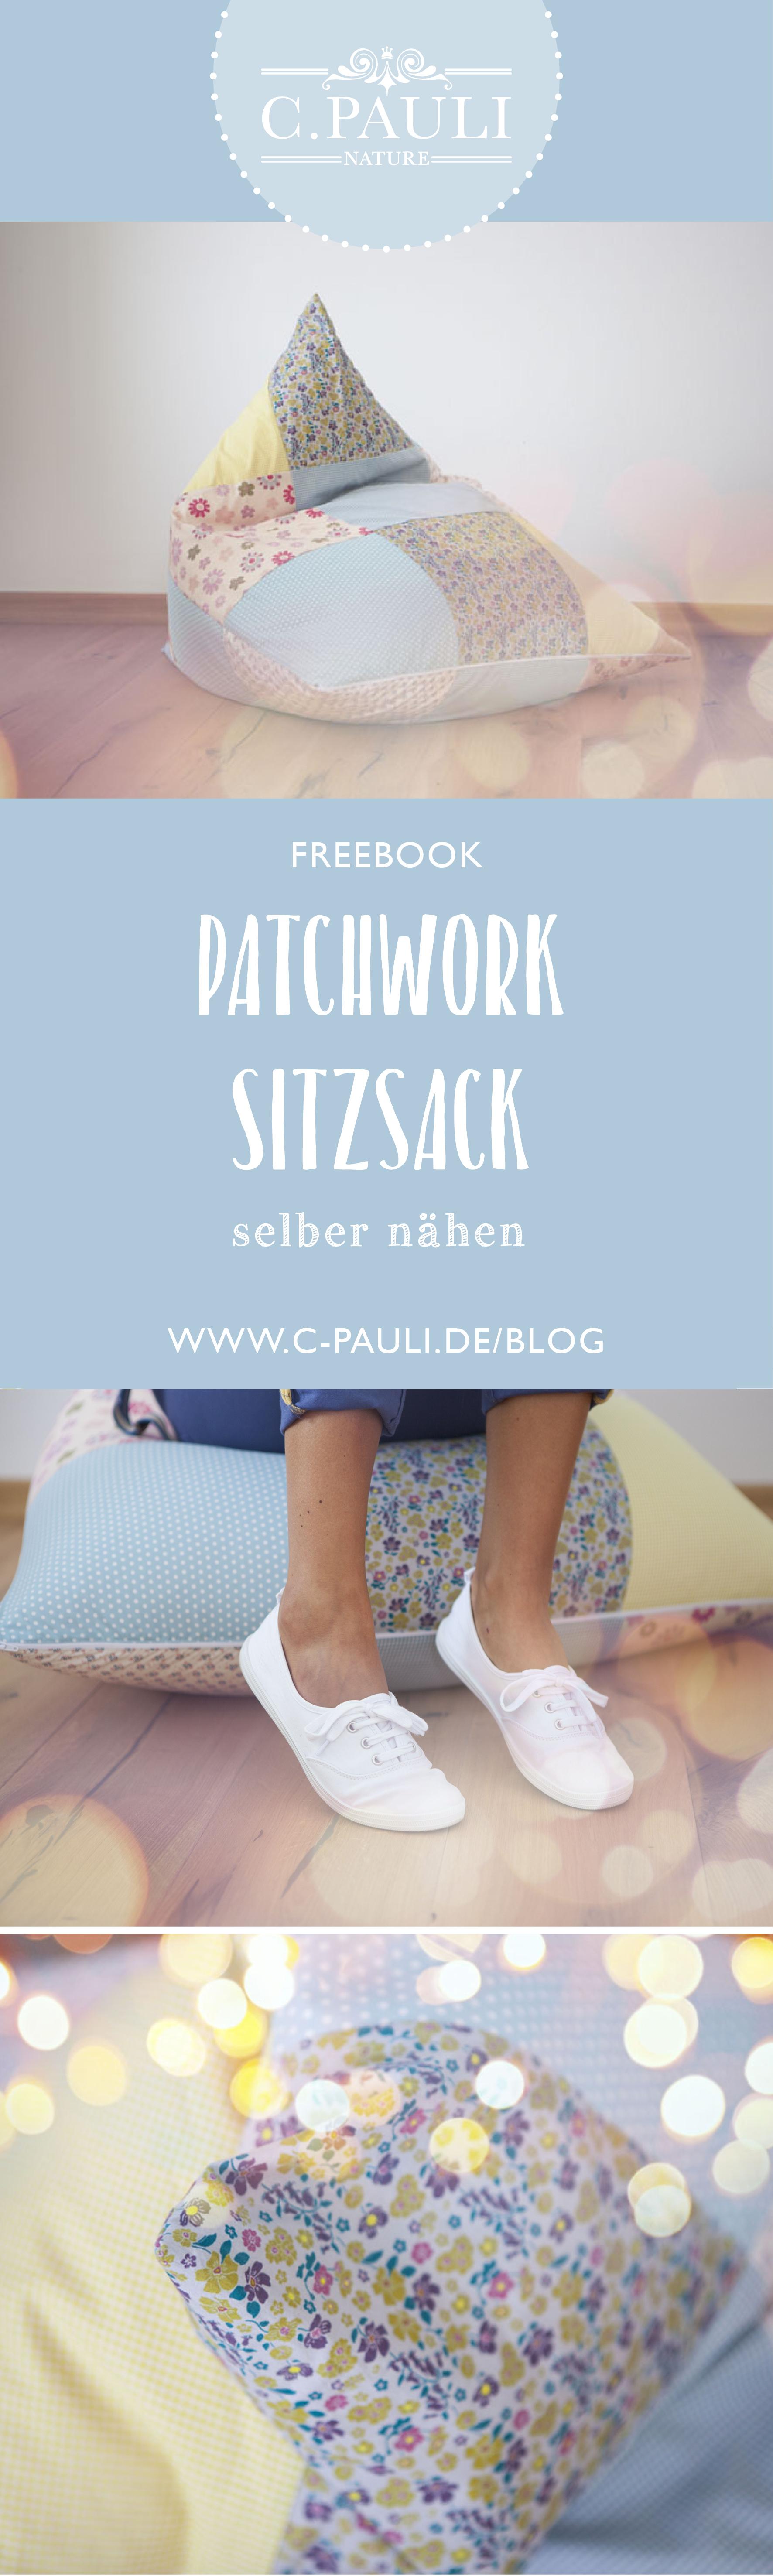 DIY Patchwork Sitzsack in Pastelltönen | C.Pauli Nature Blog